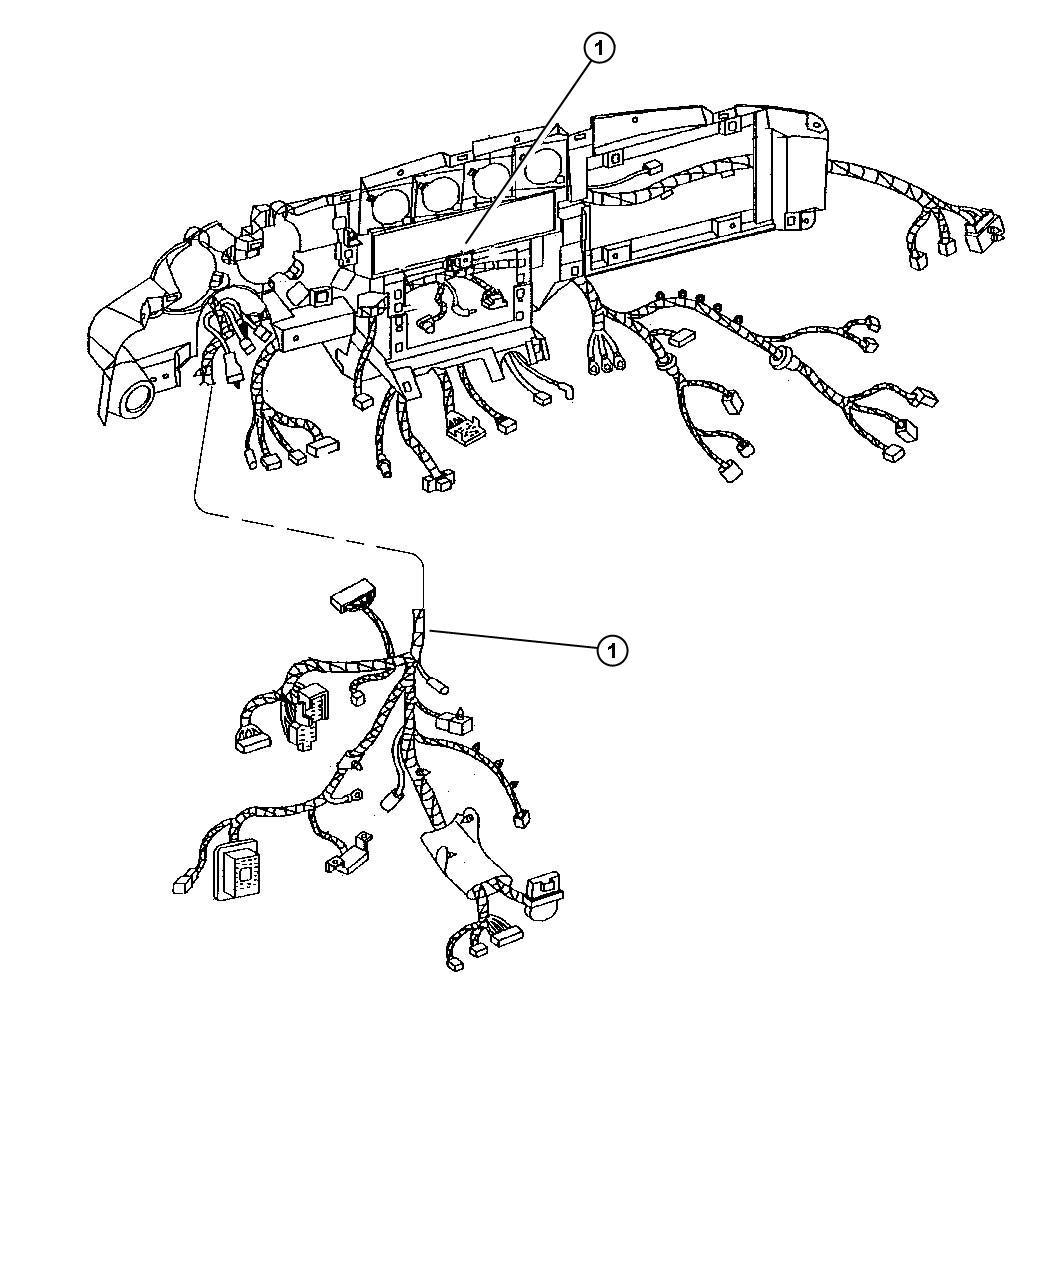 Jeep Grand Cherokee Flasher. Turn signal. Combination